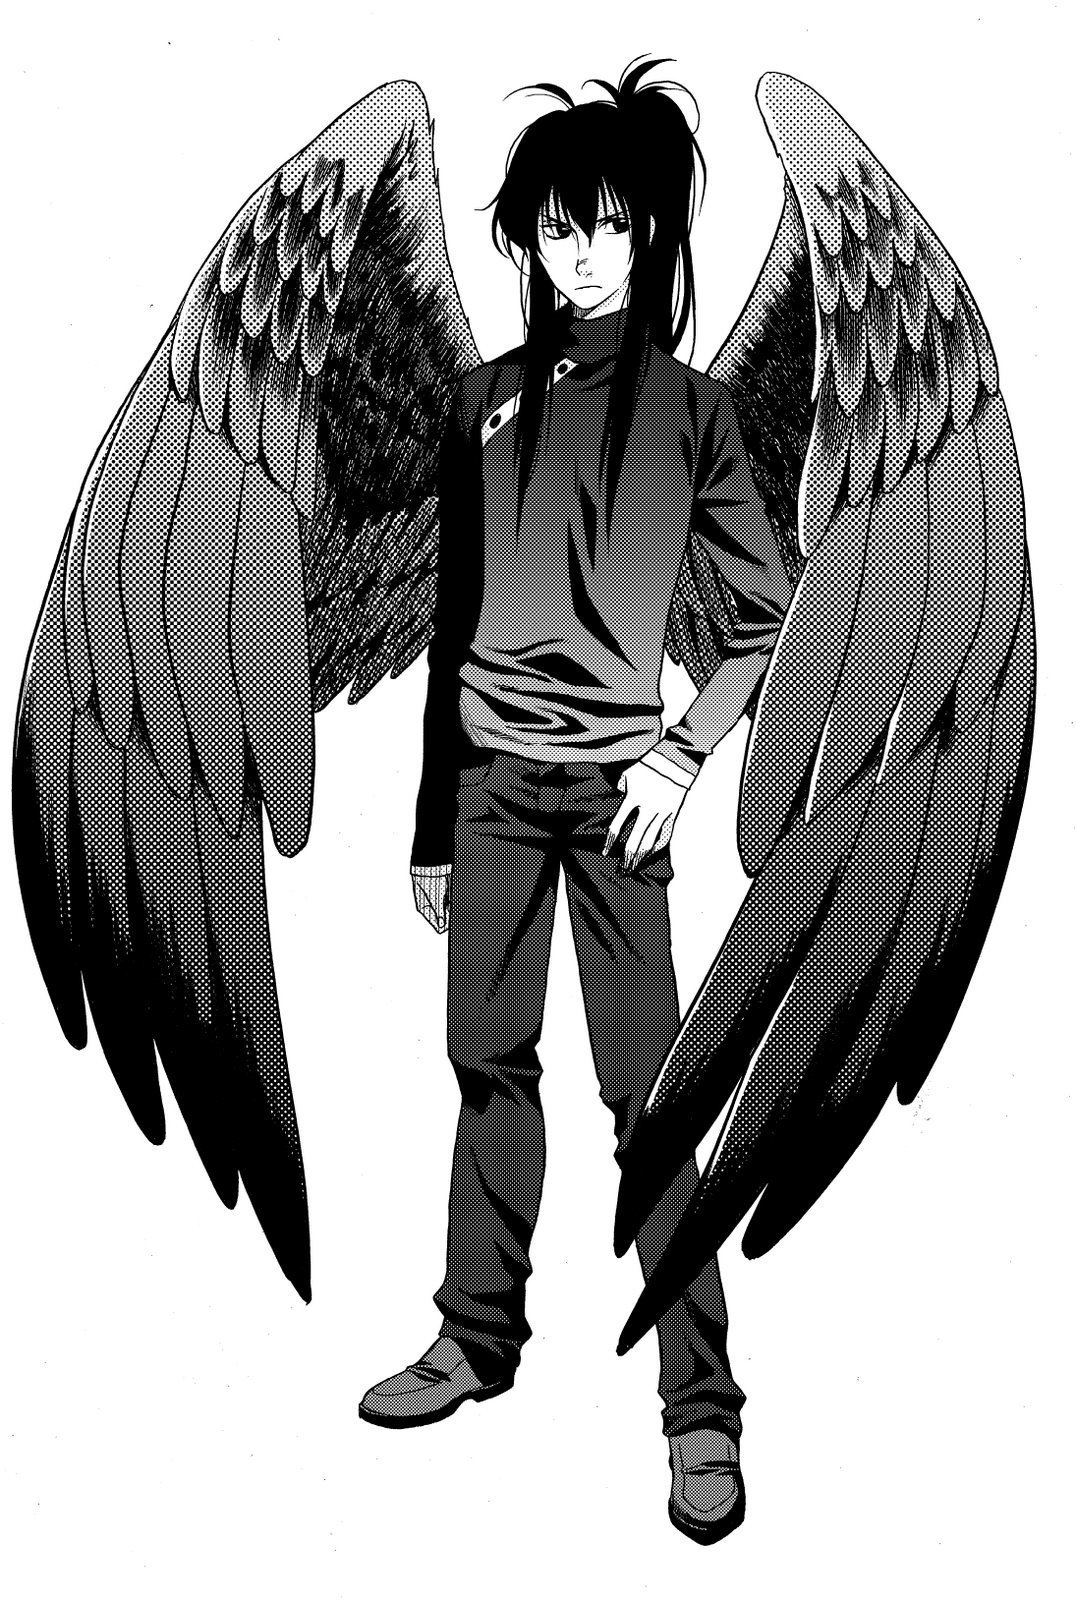 ♥*☆Manga/Anime/Game Characters that Look alike☆*♥  - Page 2 Manga-Fang-D-maximum-ride-1317769-1076-1600